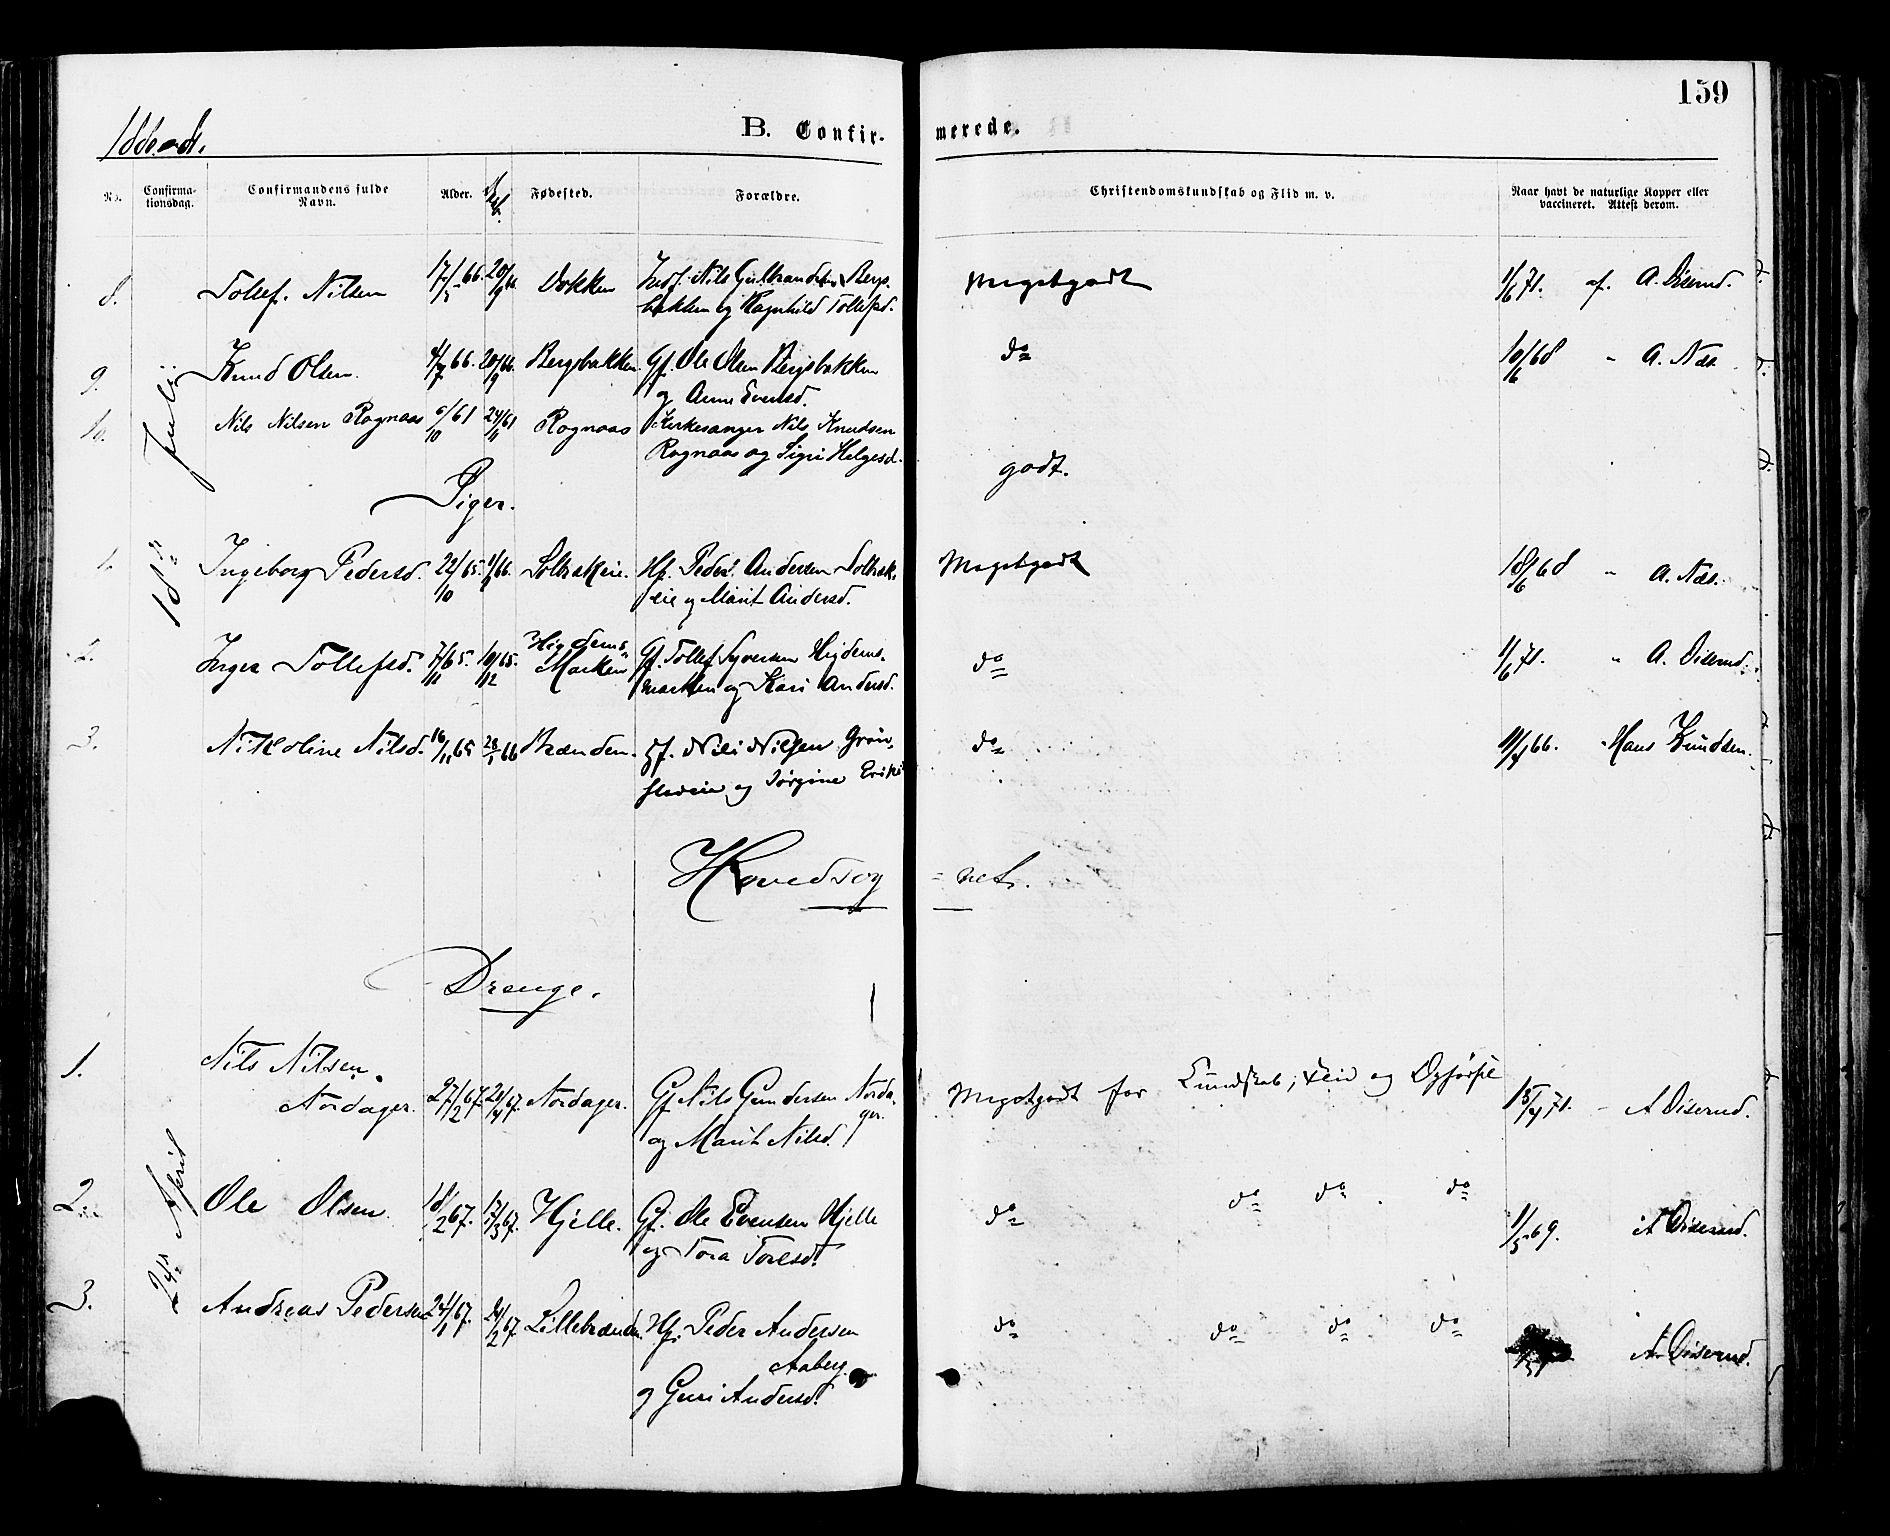 SAH, Nord-Aurdal prestekontor, Ministerialbok nr. 9, 1876-1882, s. 159